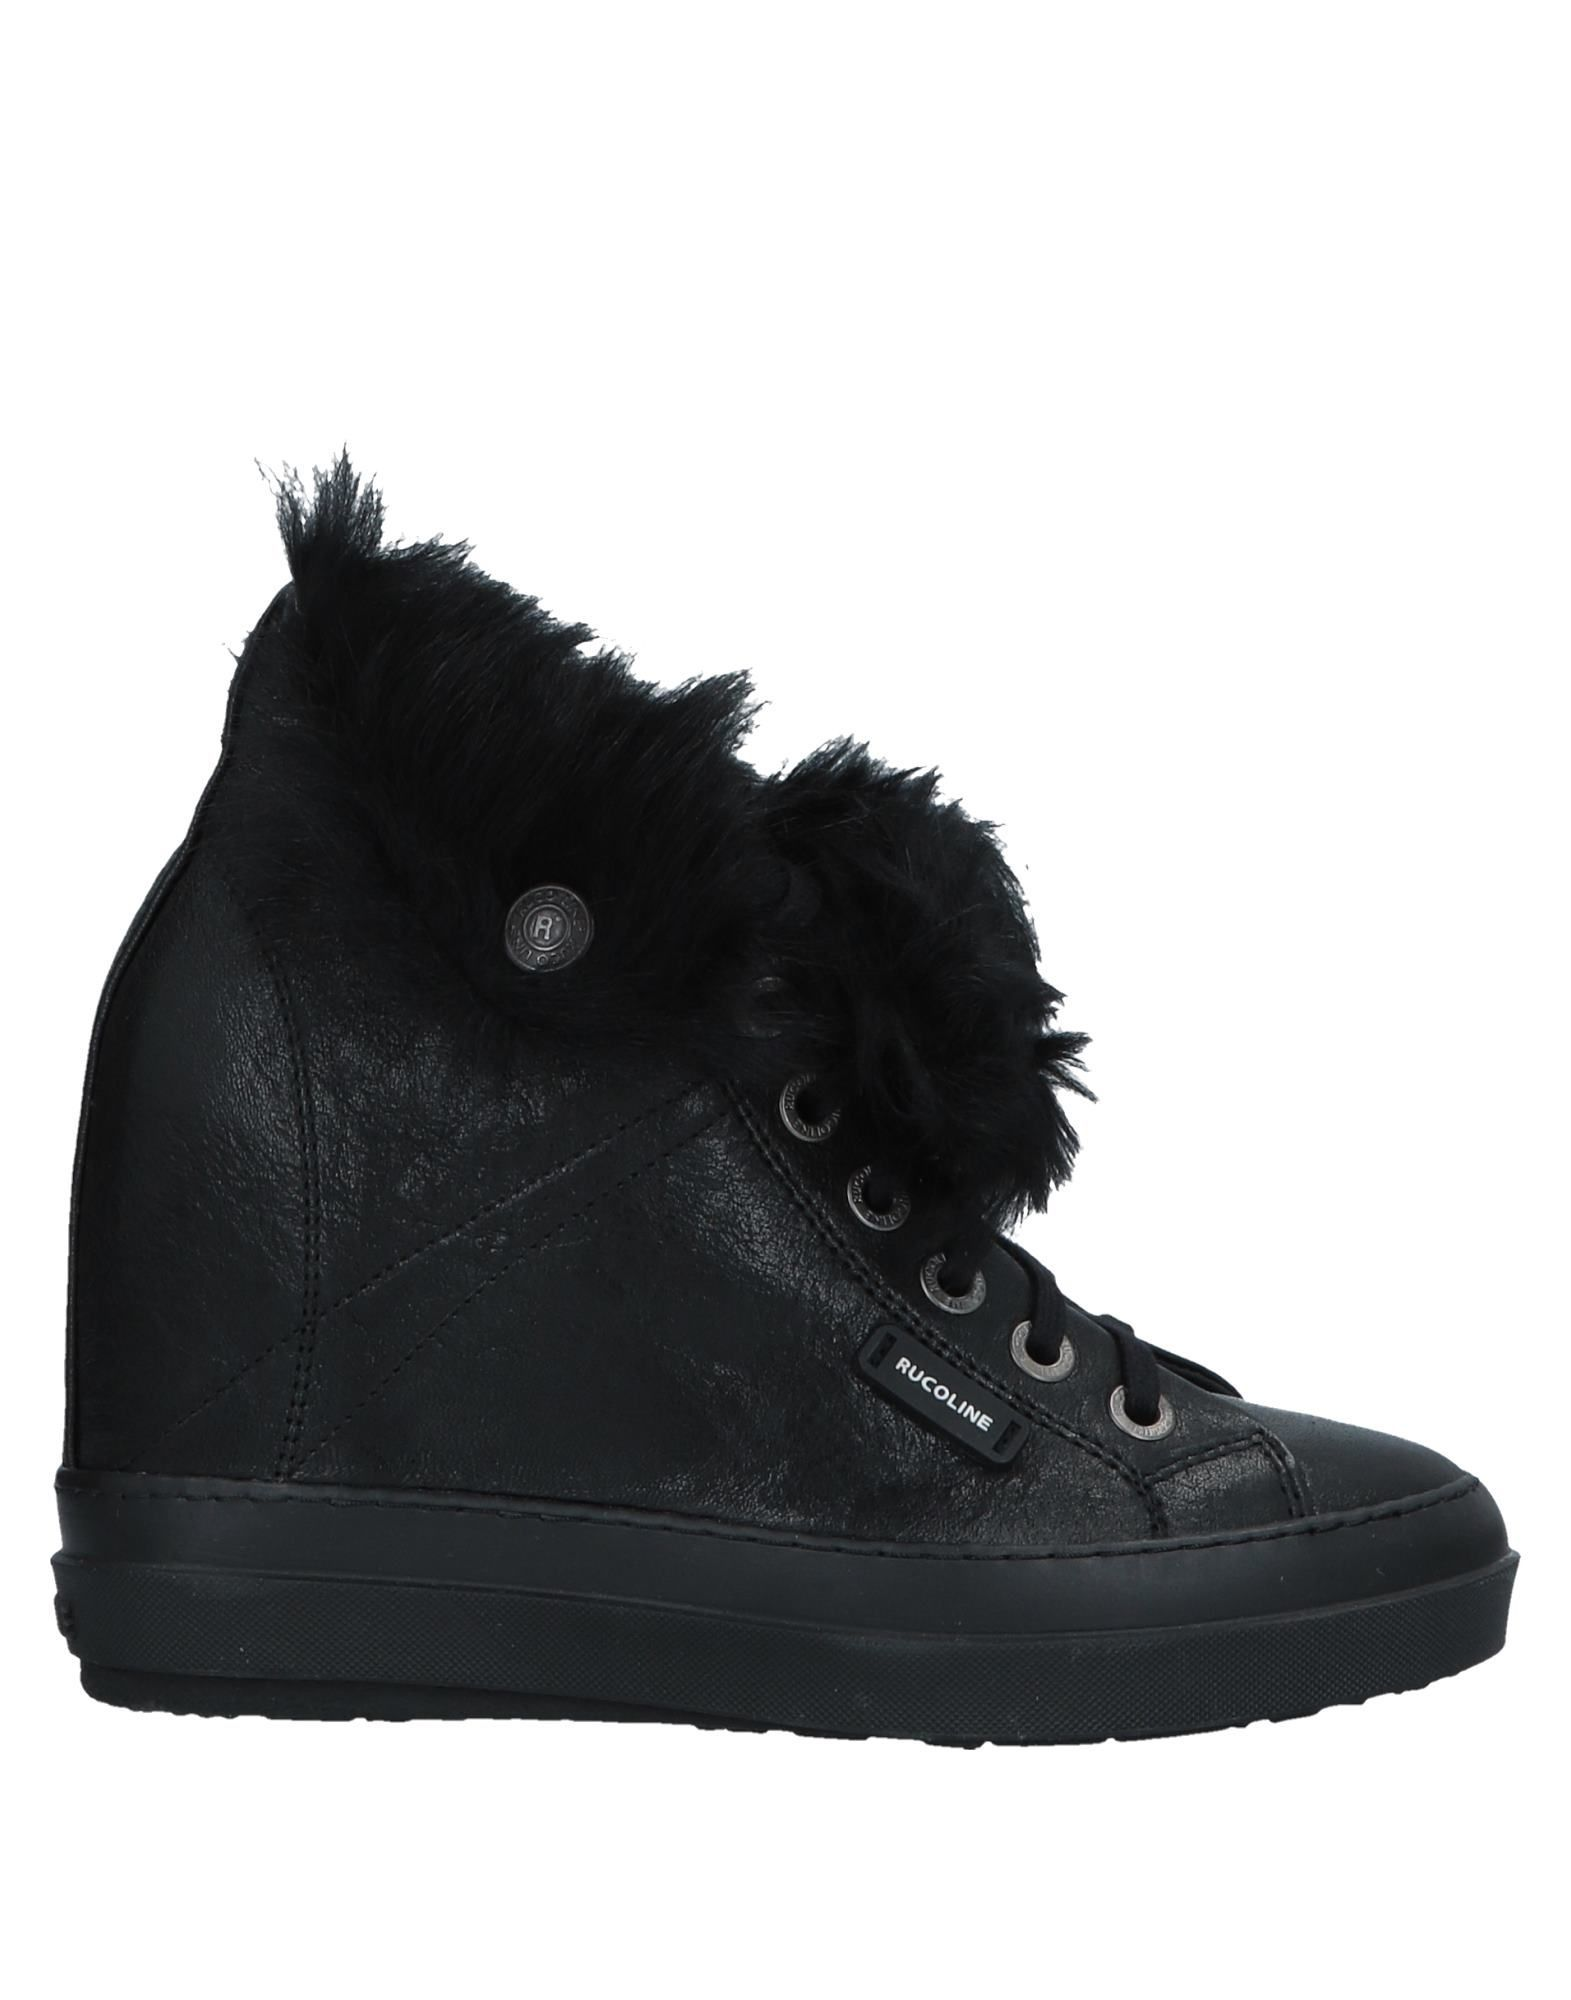 Footwear Ruco Line Black Women's Shearling